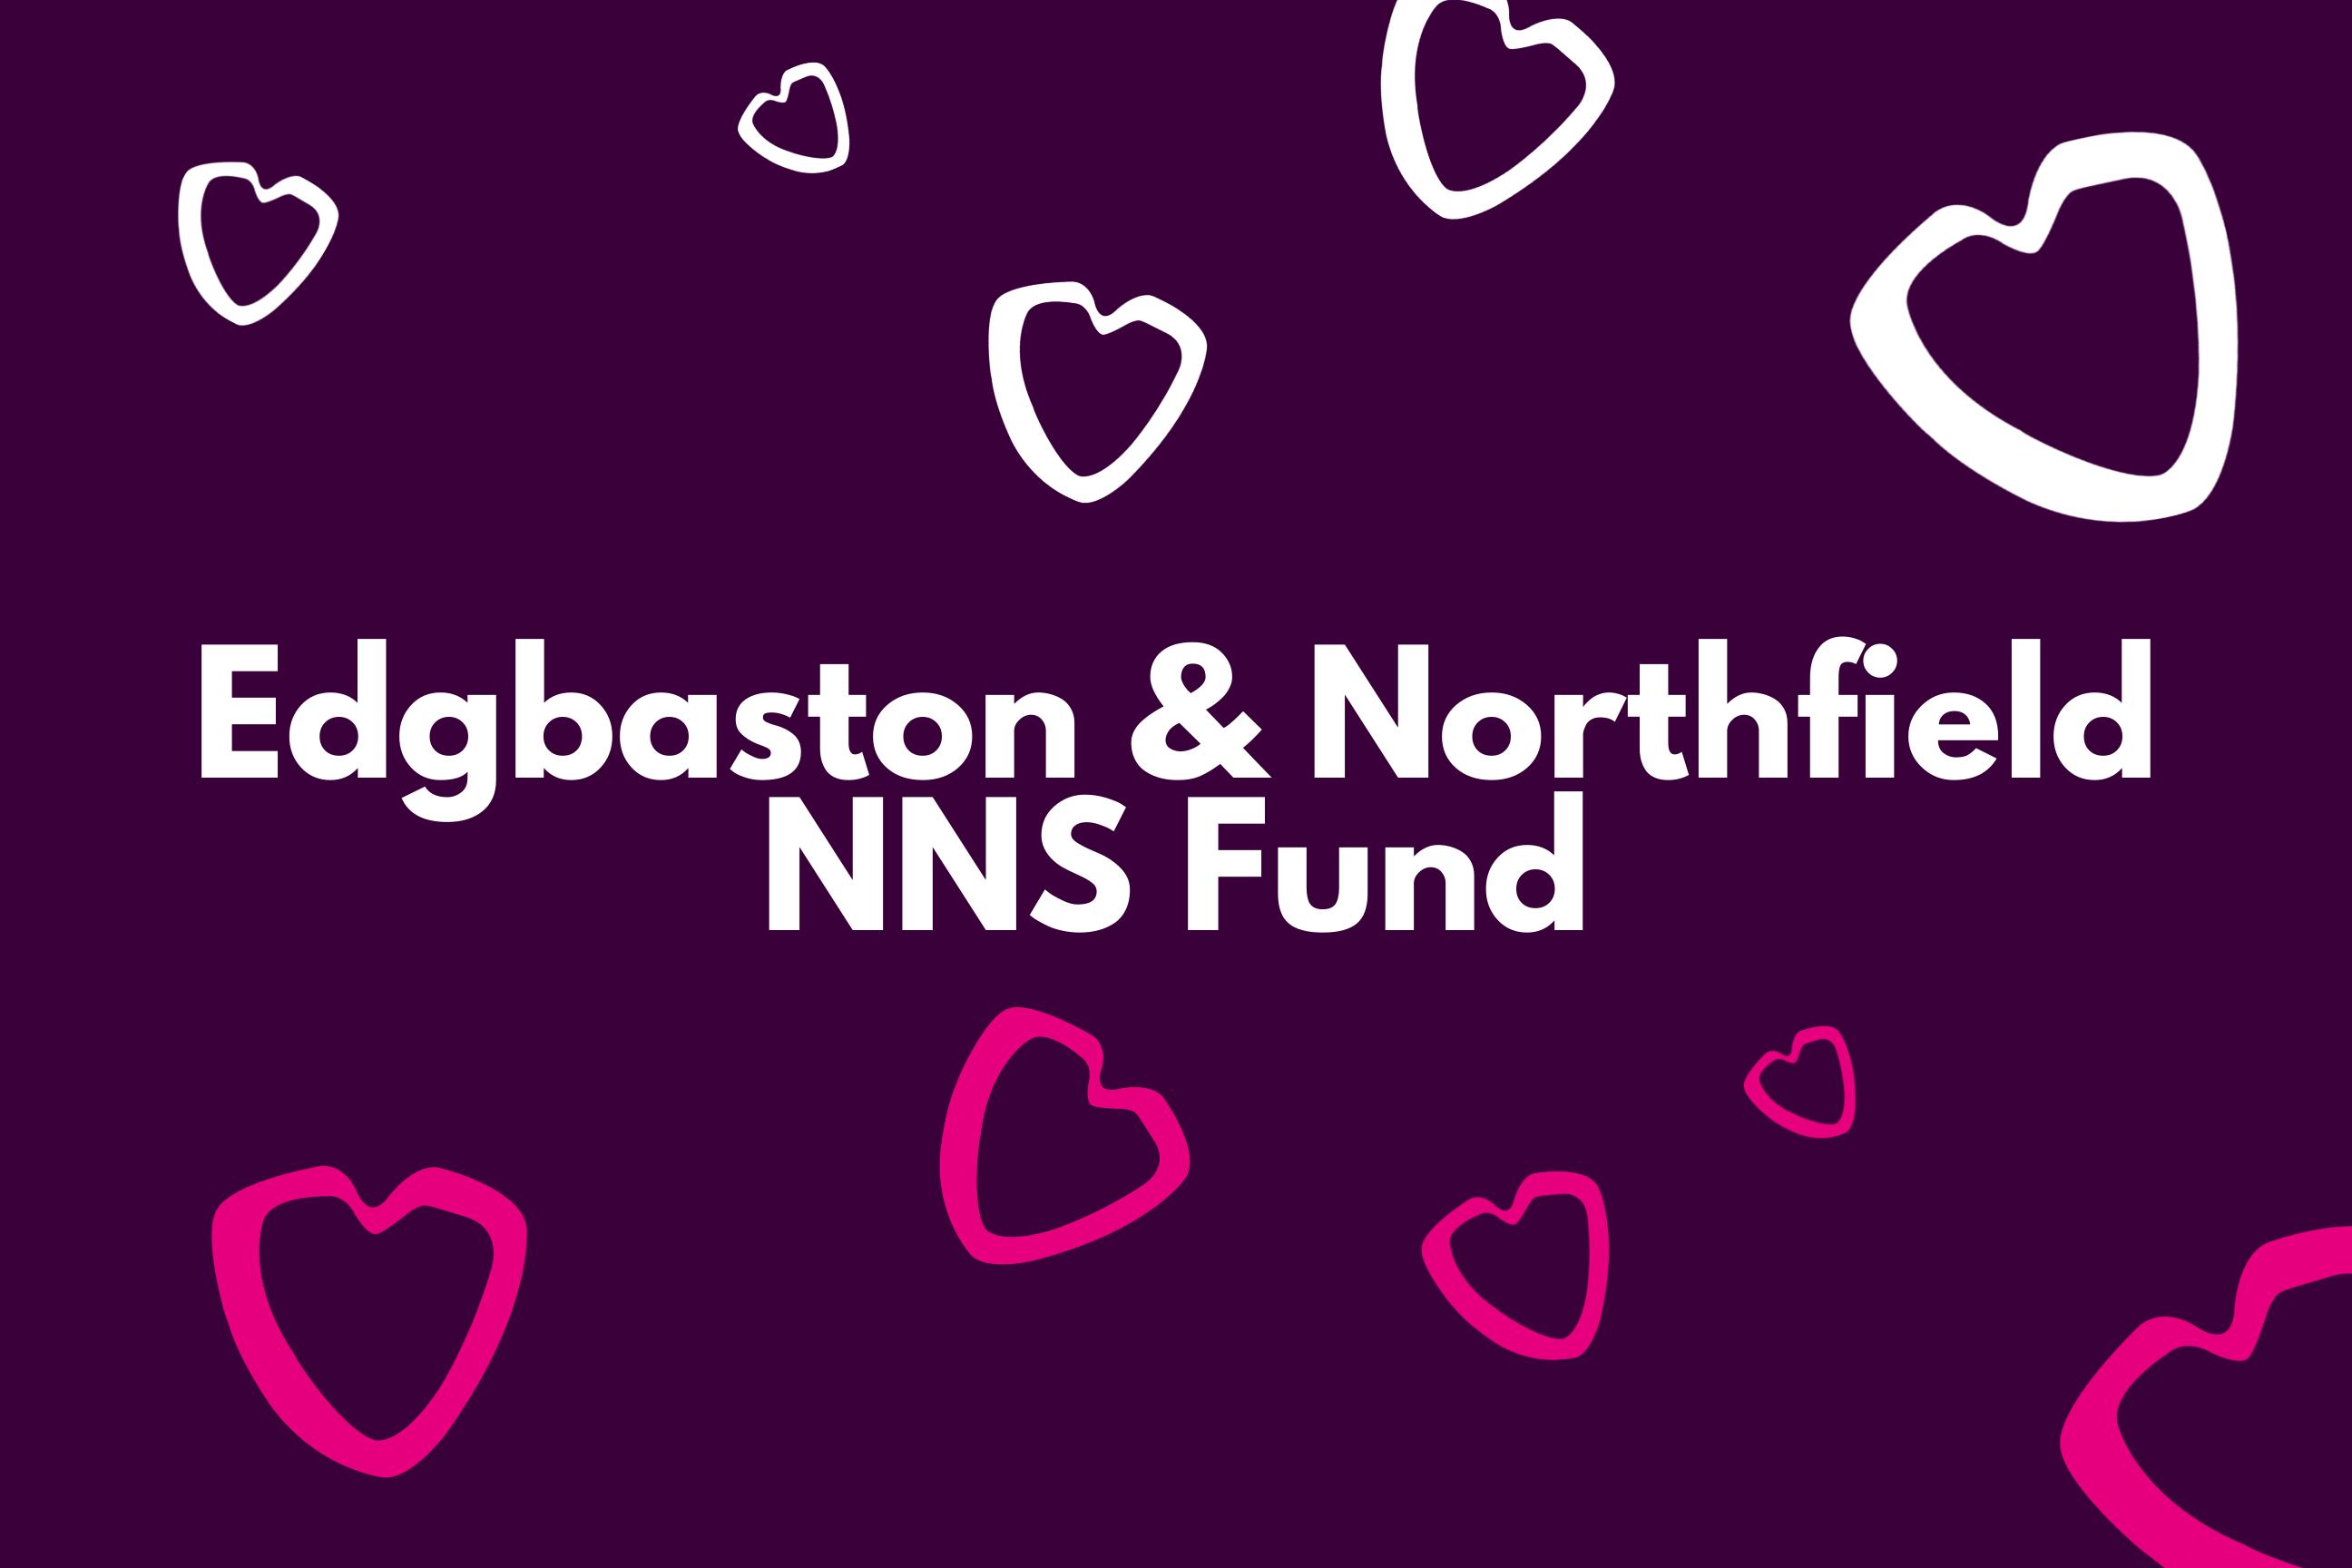 Edgbaston & Northfield NNS Fund